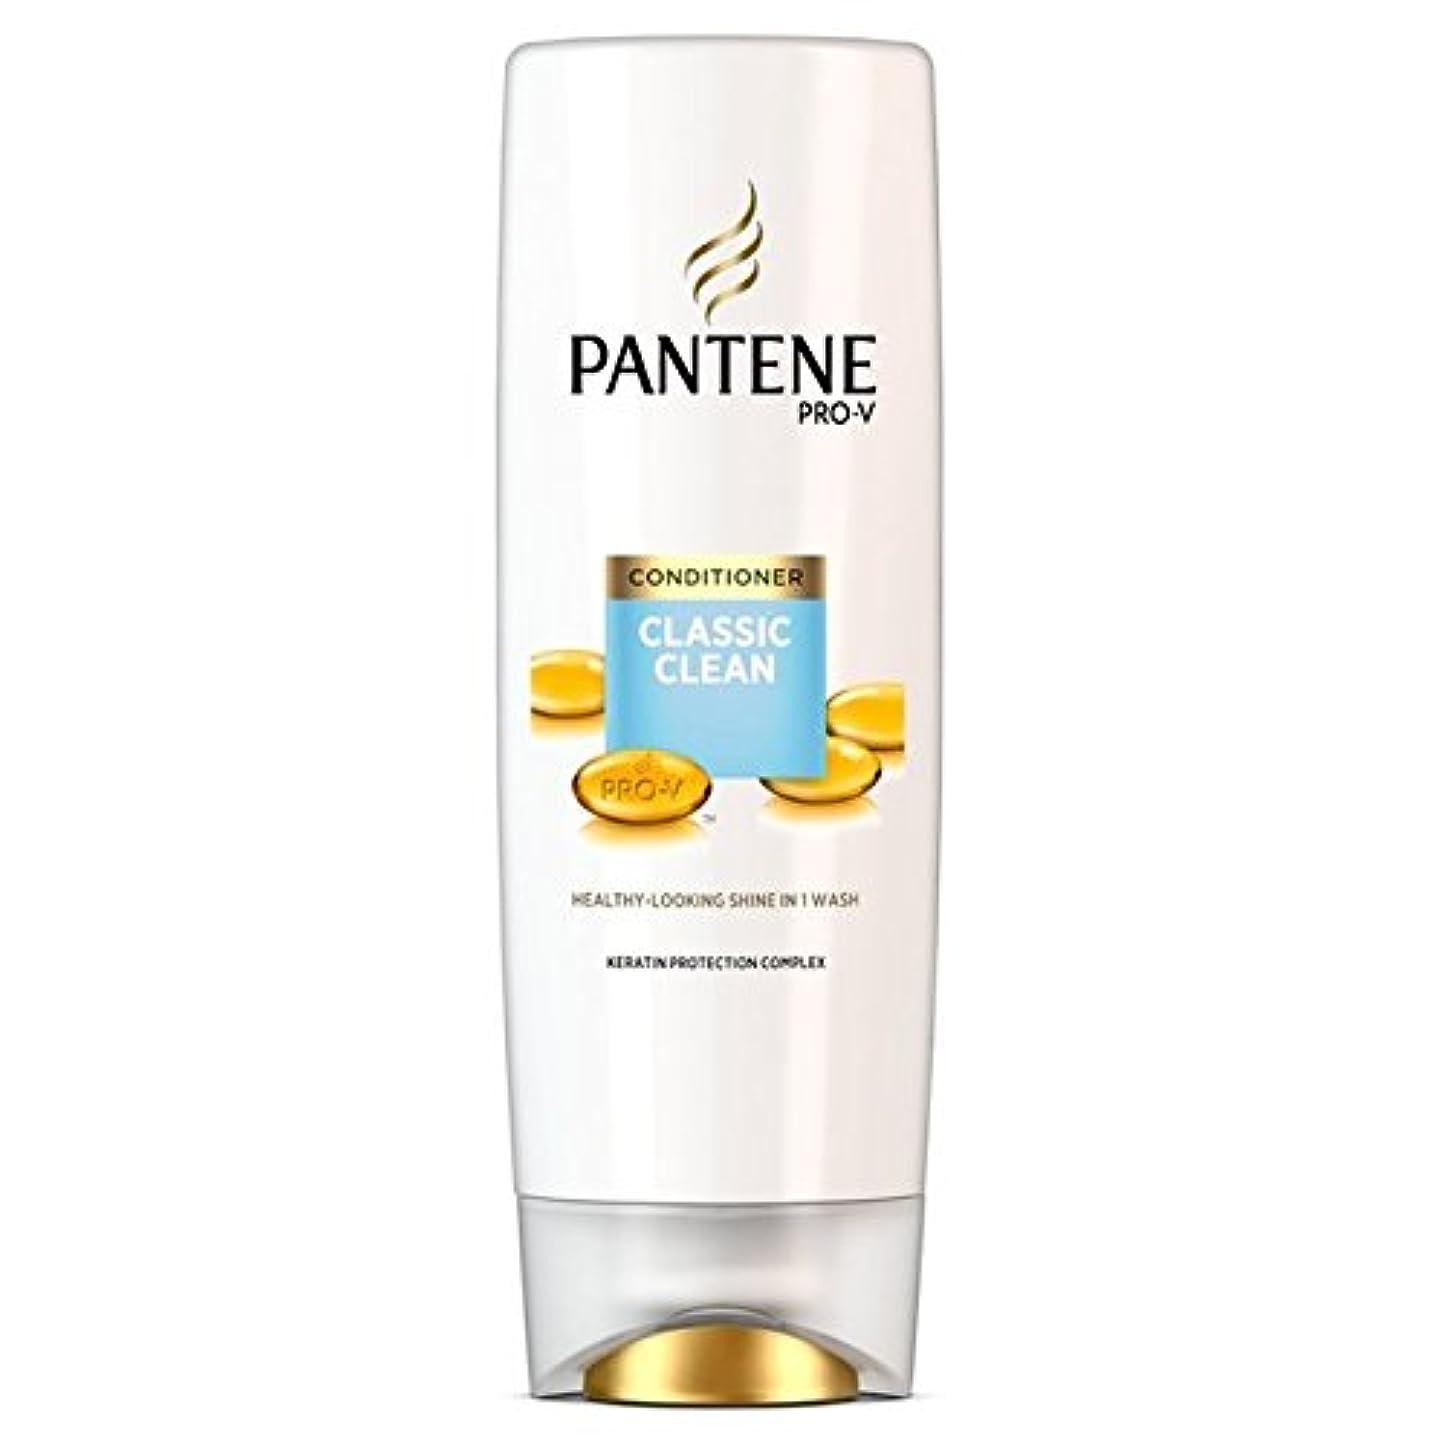 Pantene Classic Clean Conditioner 360ml - パンテーン古典的なクリーンコンディショナー360ミリリットル [並行輸入品]